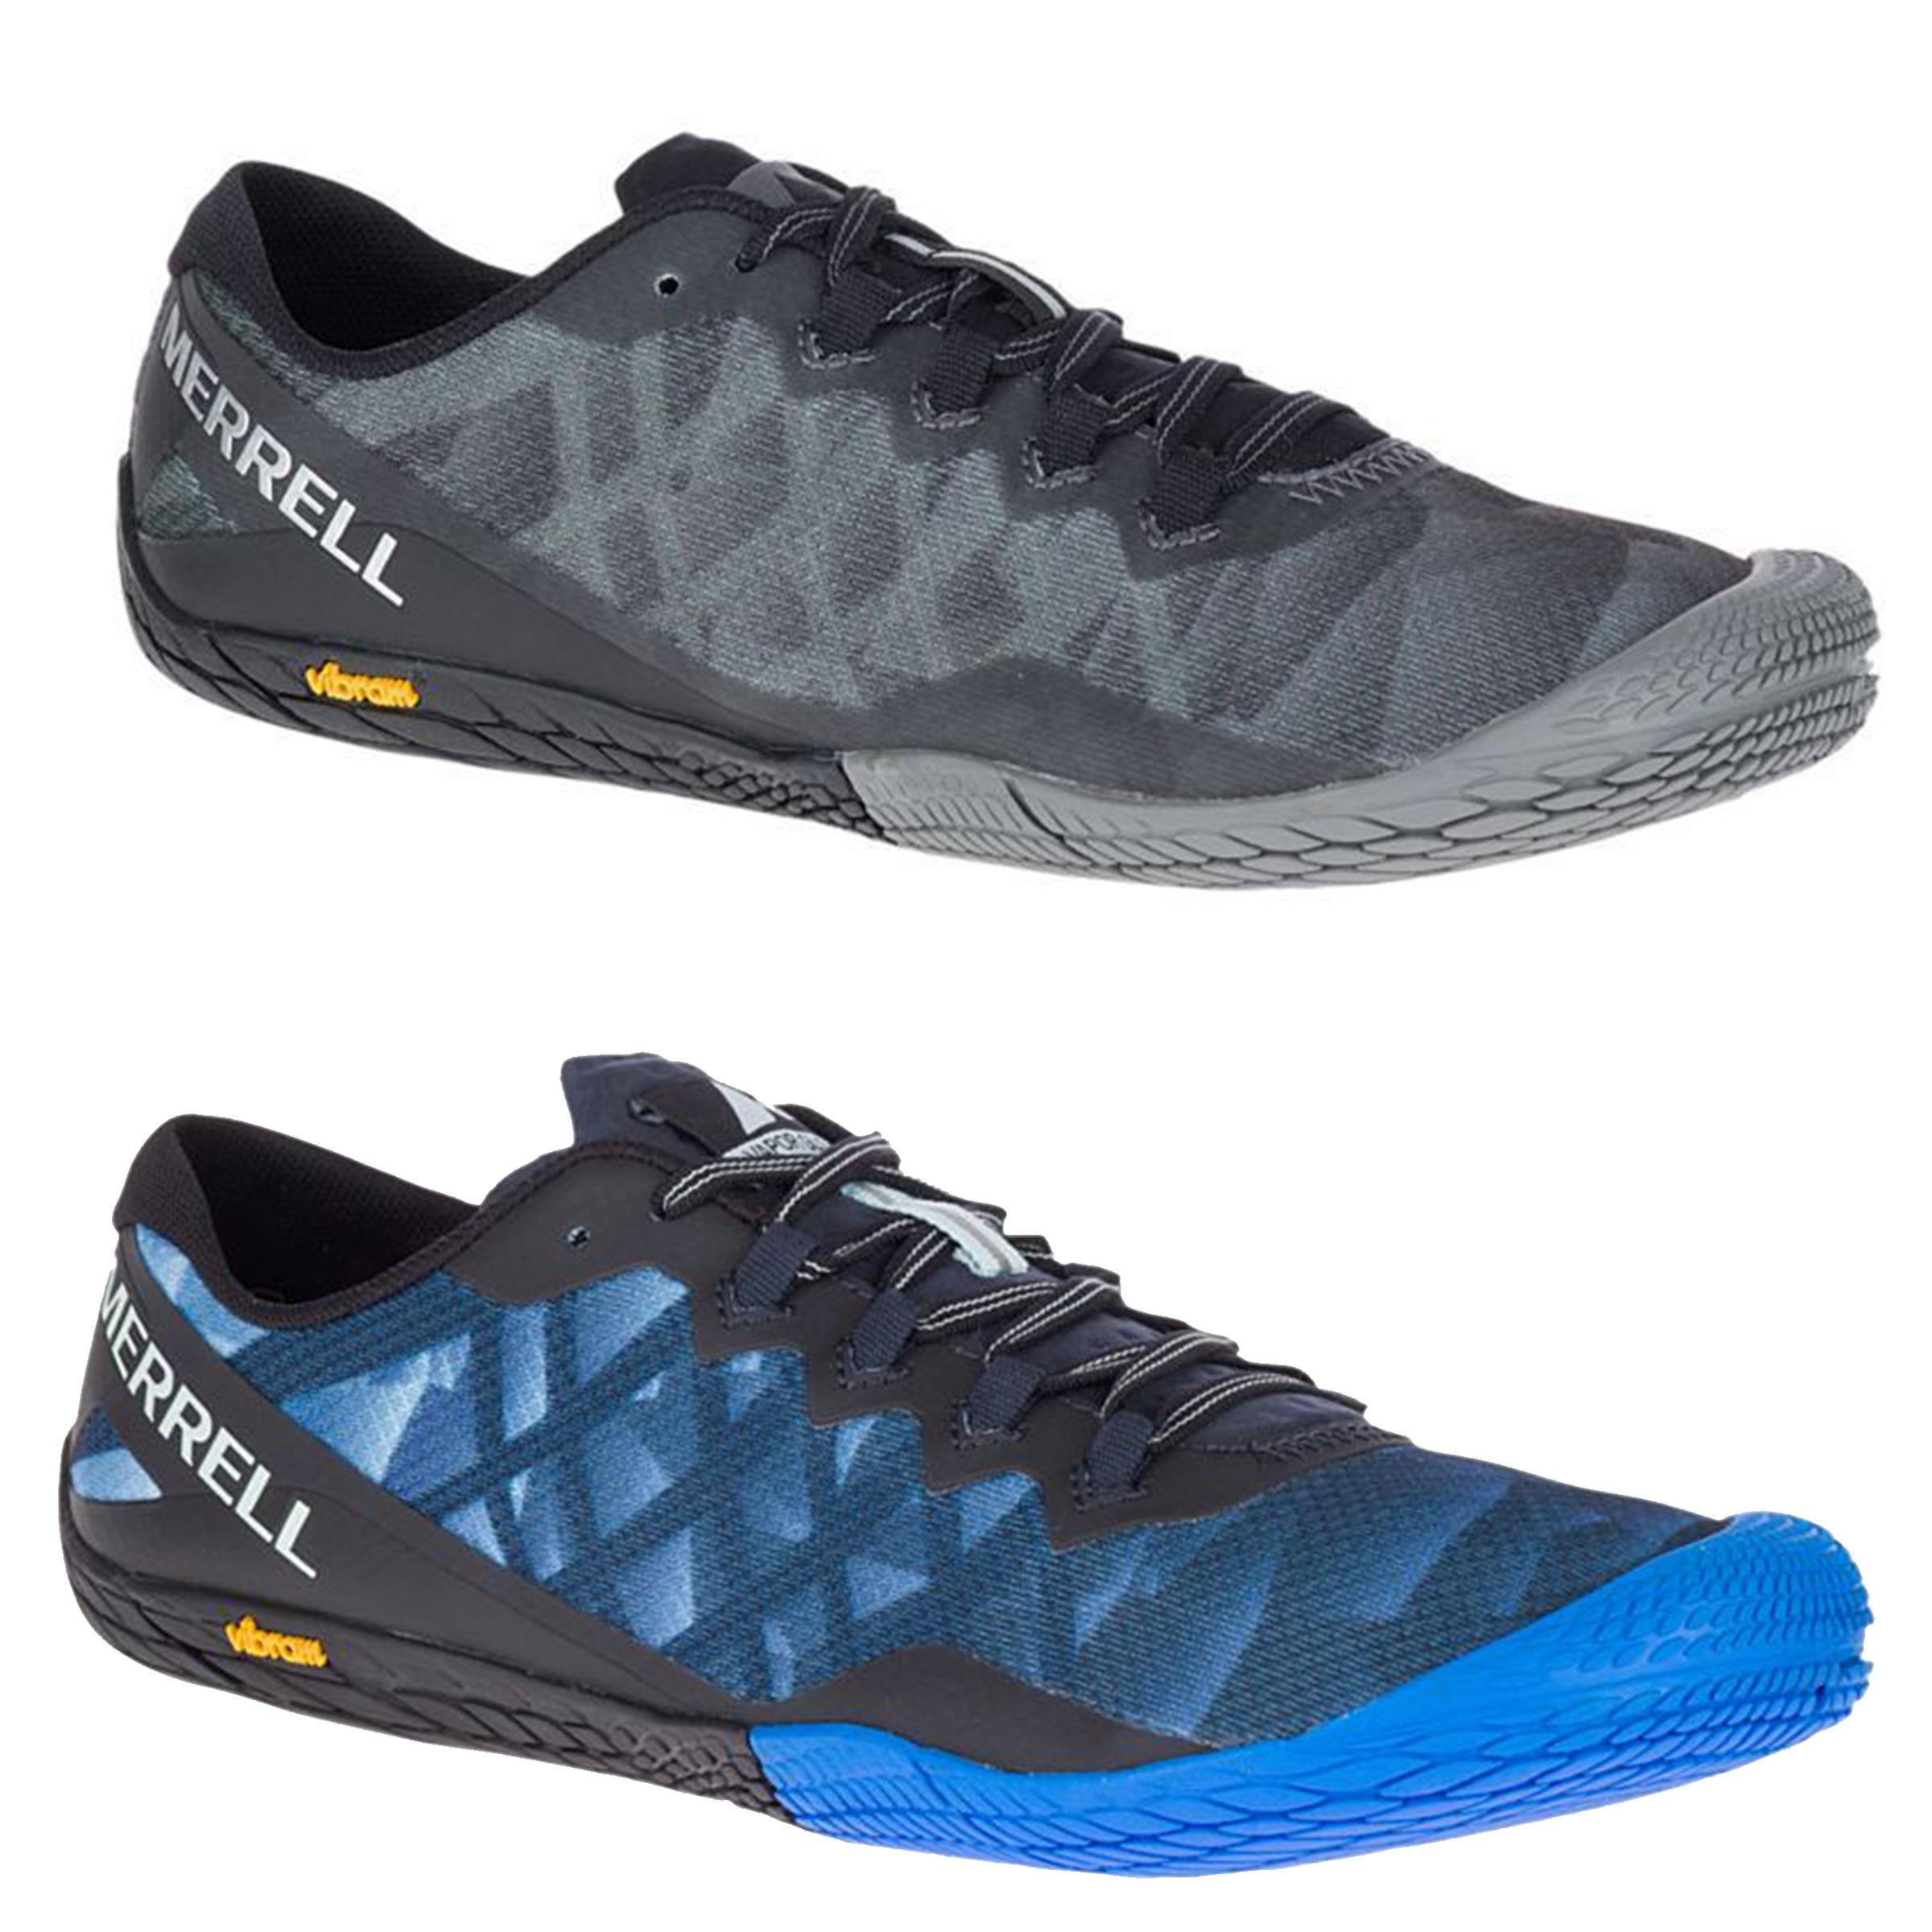 09769947dbb Mens Merrell Vapor Glove 3 Running Barefoot Vibram Trainers Sizes 7 to 12.5